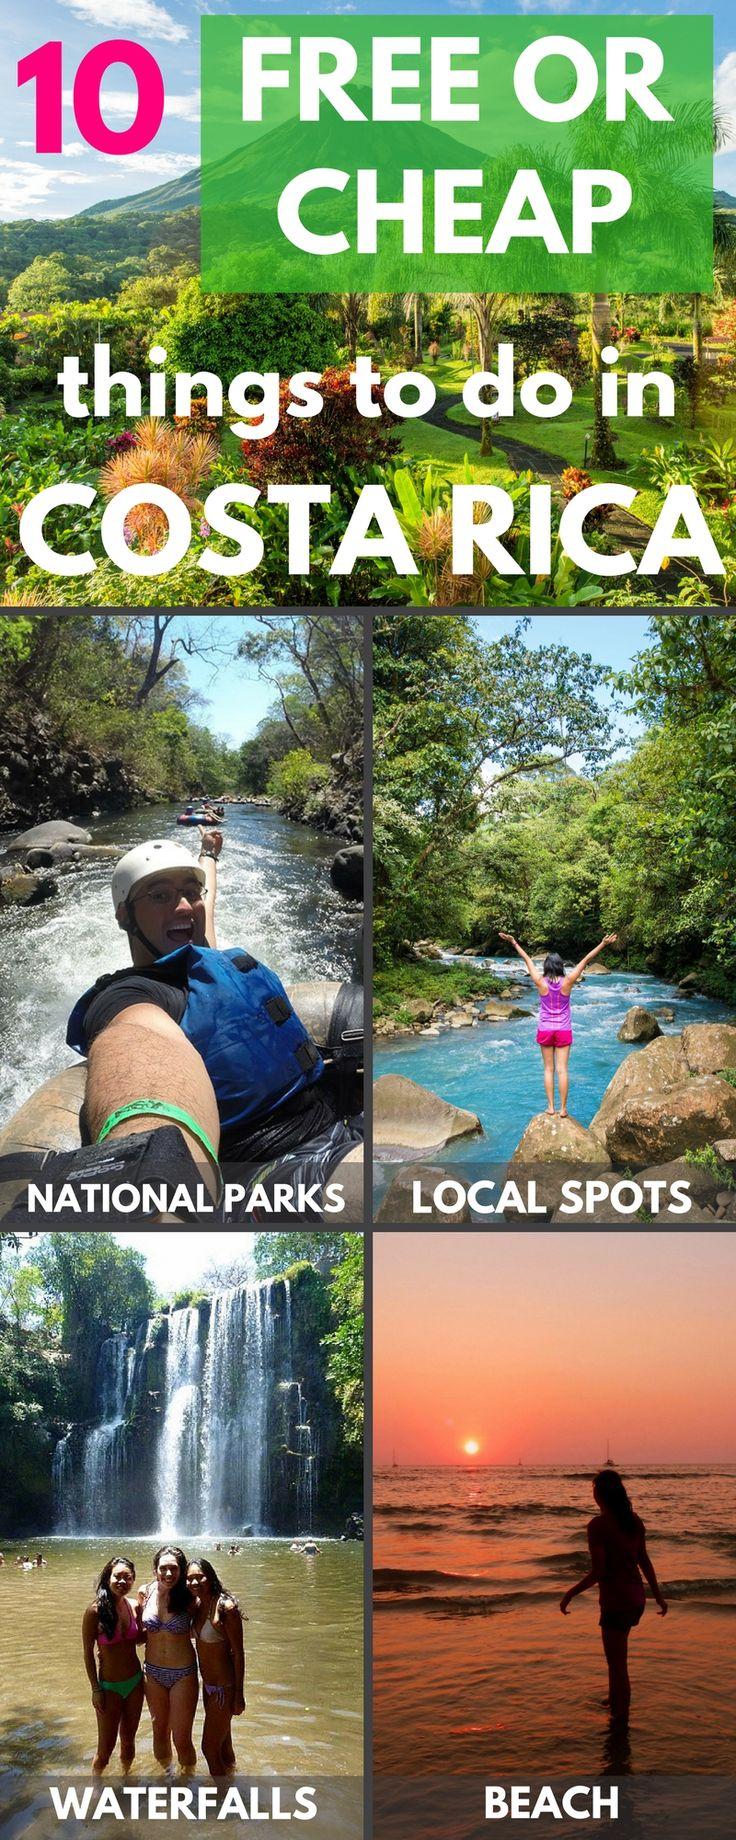 Best Vacation In Costa Rica Ideas On Pinterest Costa Rica - Cheap costa rica vacations